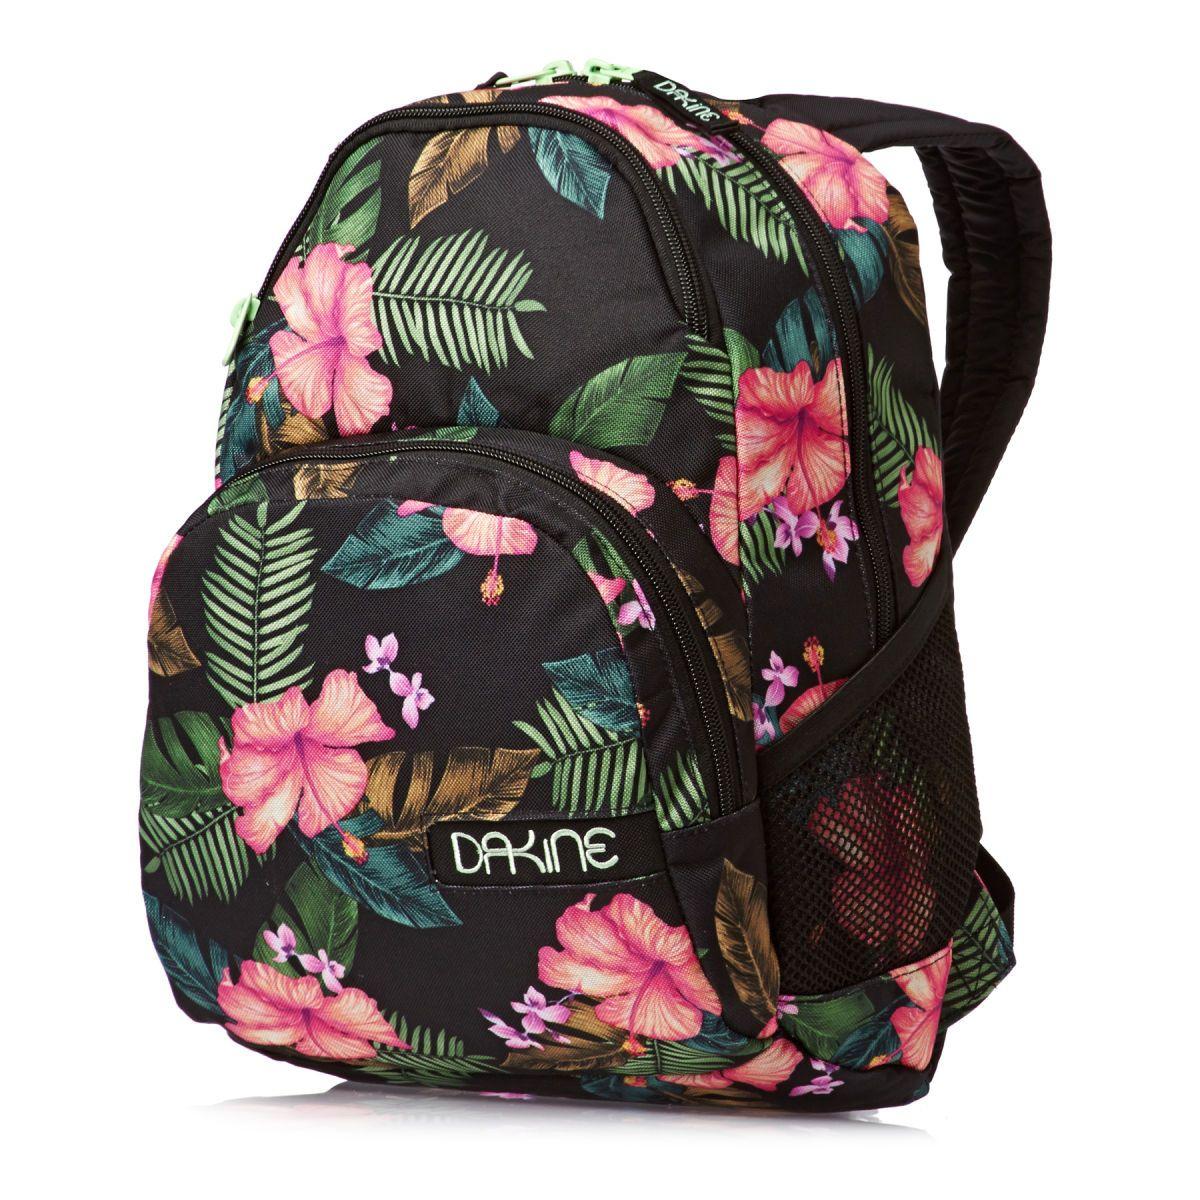 Dakine Milo Backpack - Alana | Free UK Delivery on All Orders ...